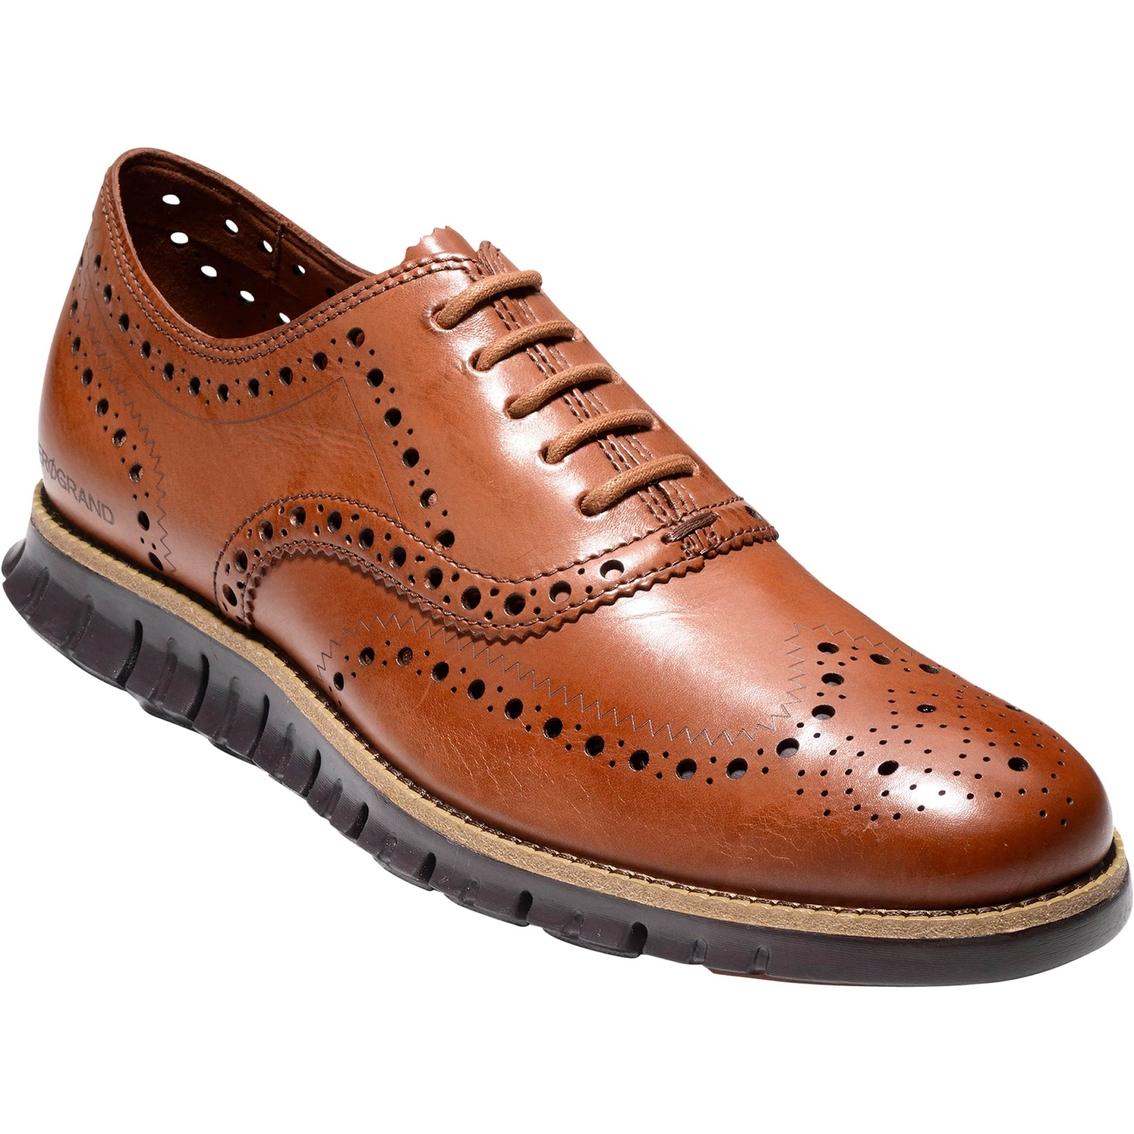 40dcb8989b8 Cole Haan Men s Zerogrand Wingtip Oxford Shoes